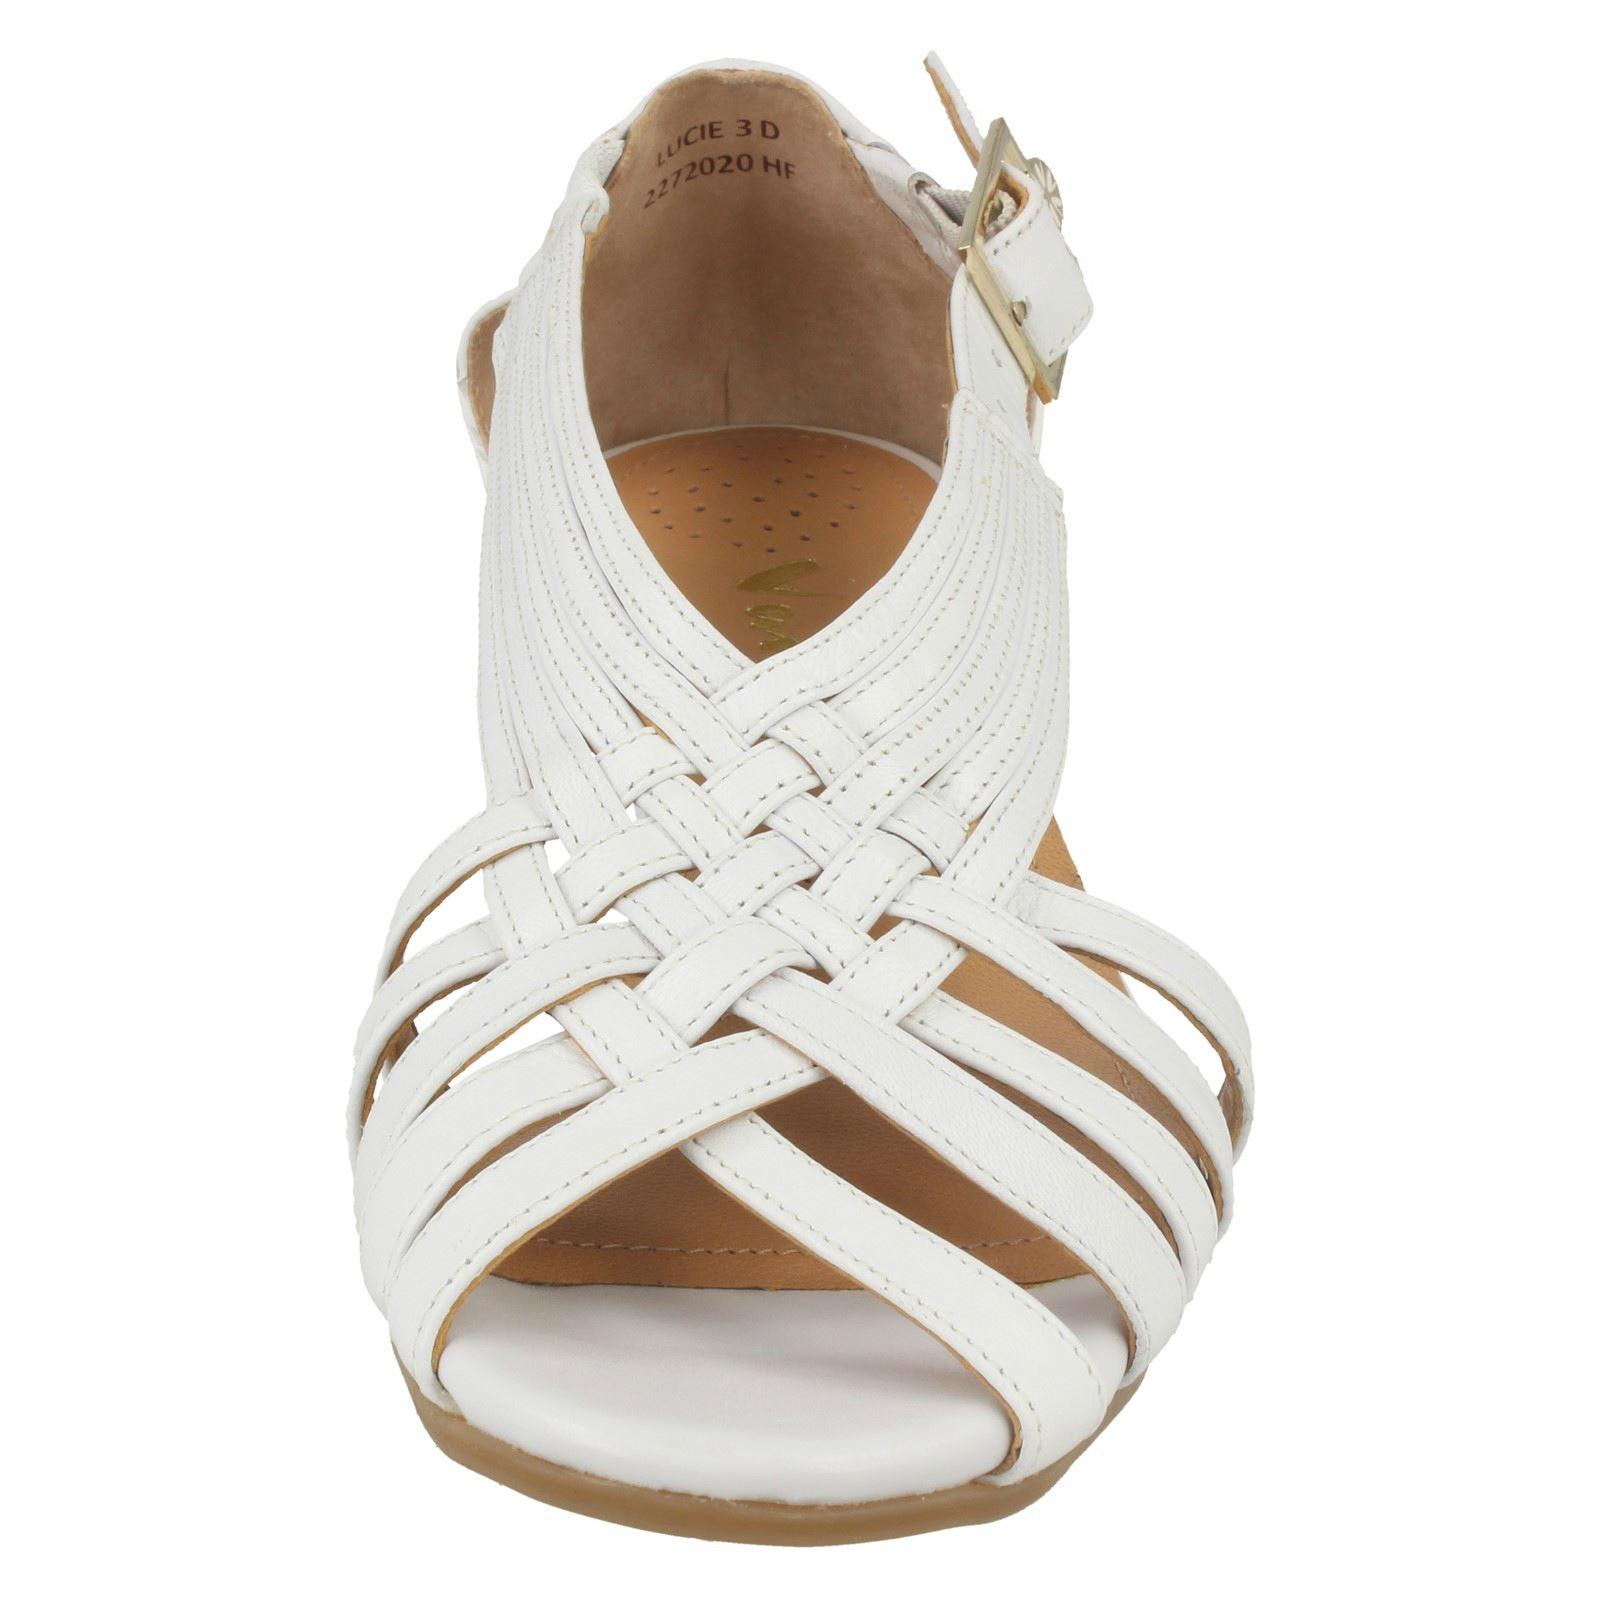 Ladies-Van-Dal-Wedge-Strappy-Sandals-Lucie thumbnail 14